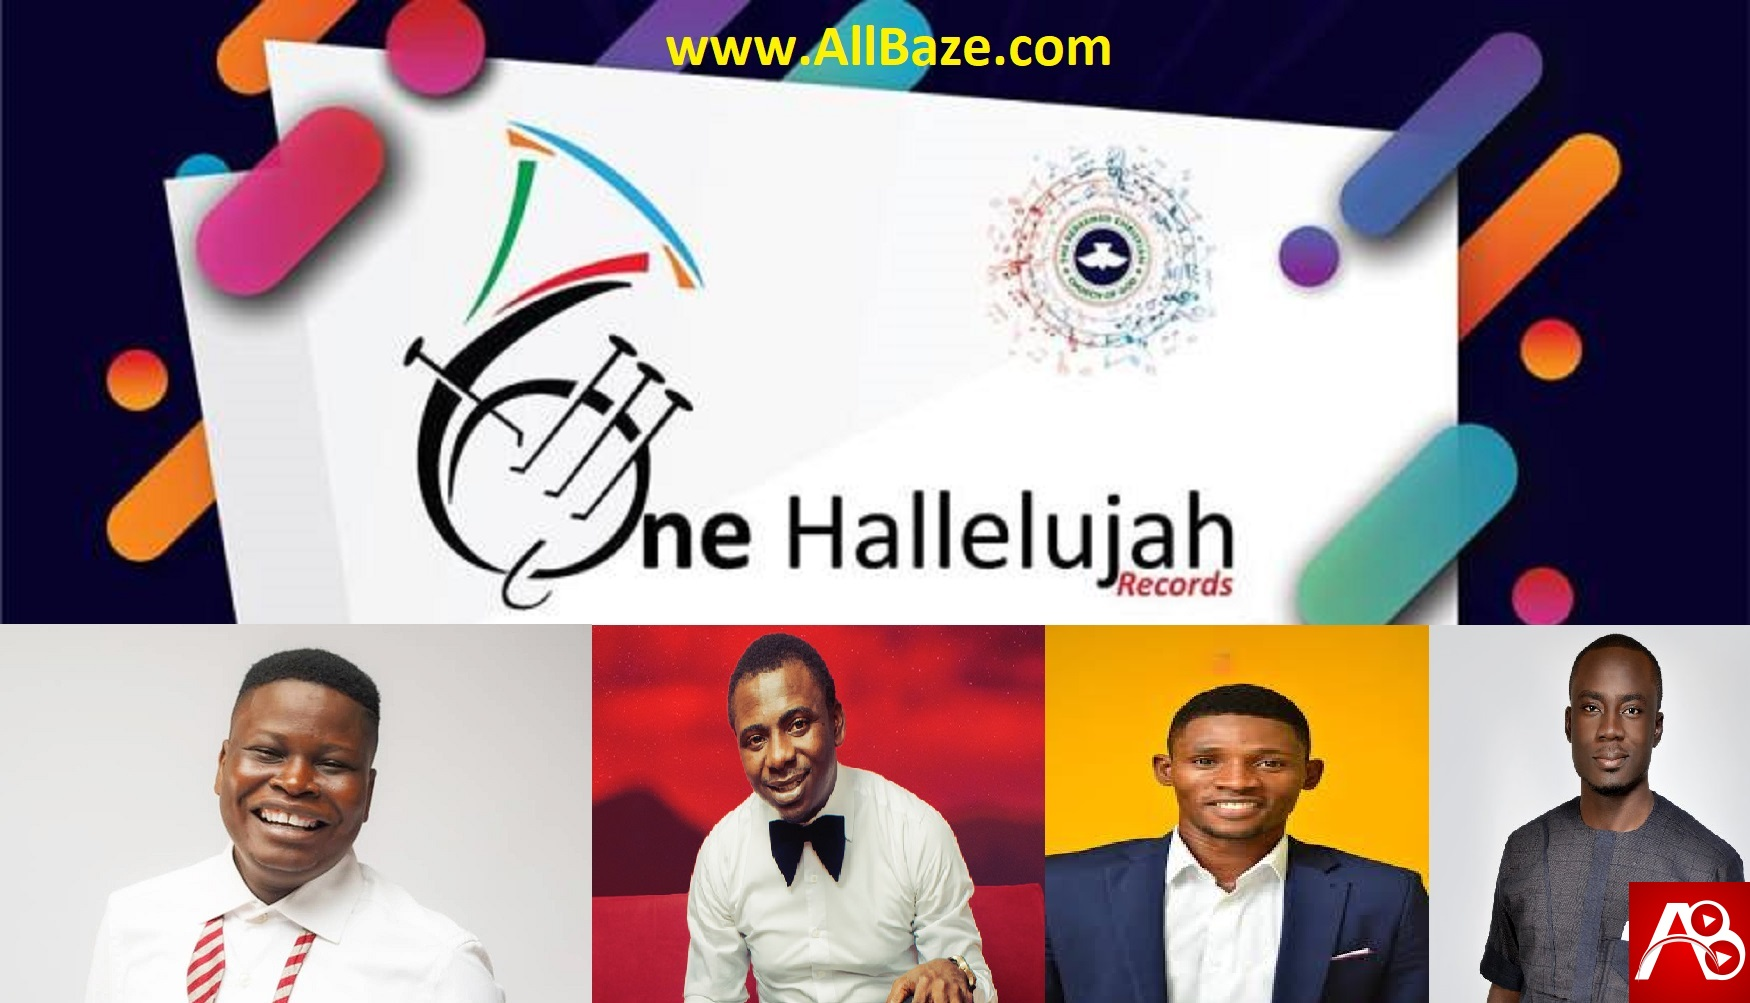 One Hallelujah Records Label Artists